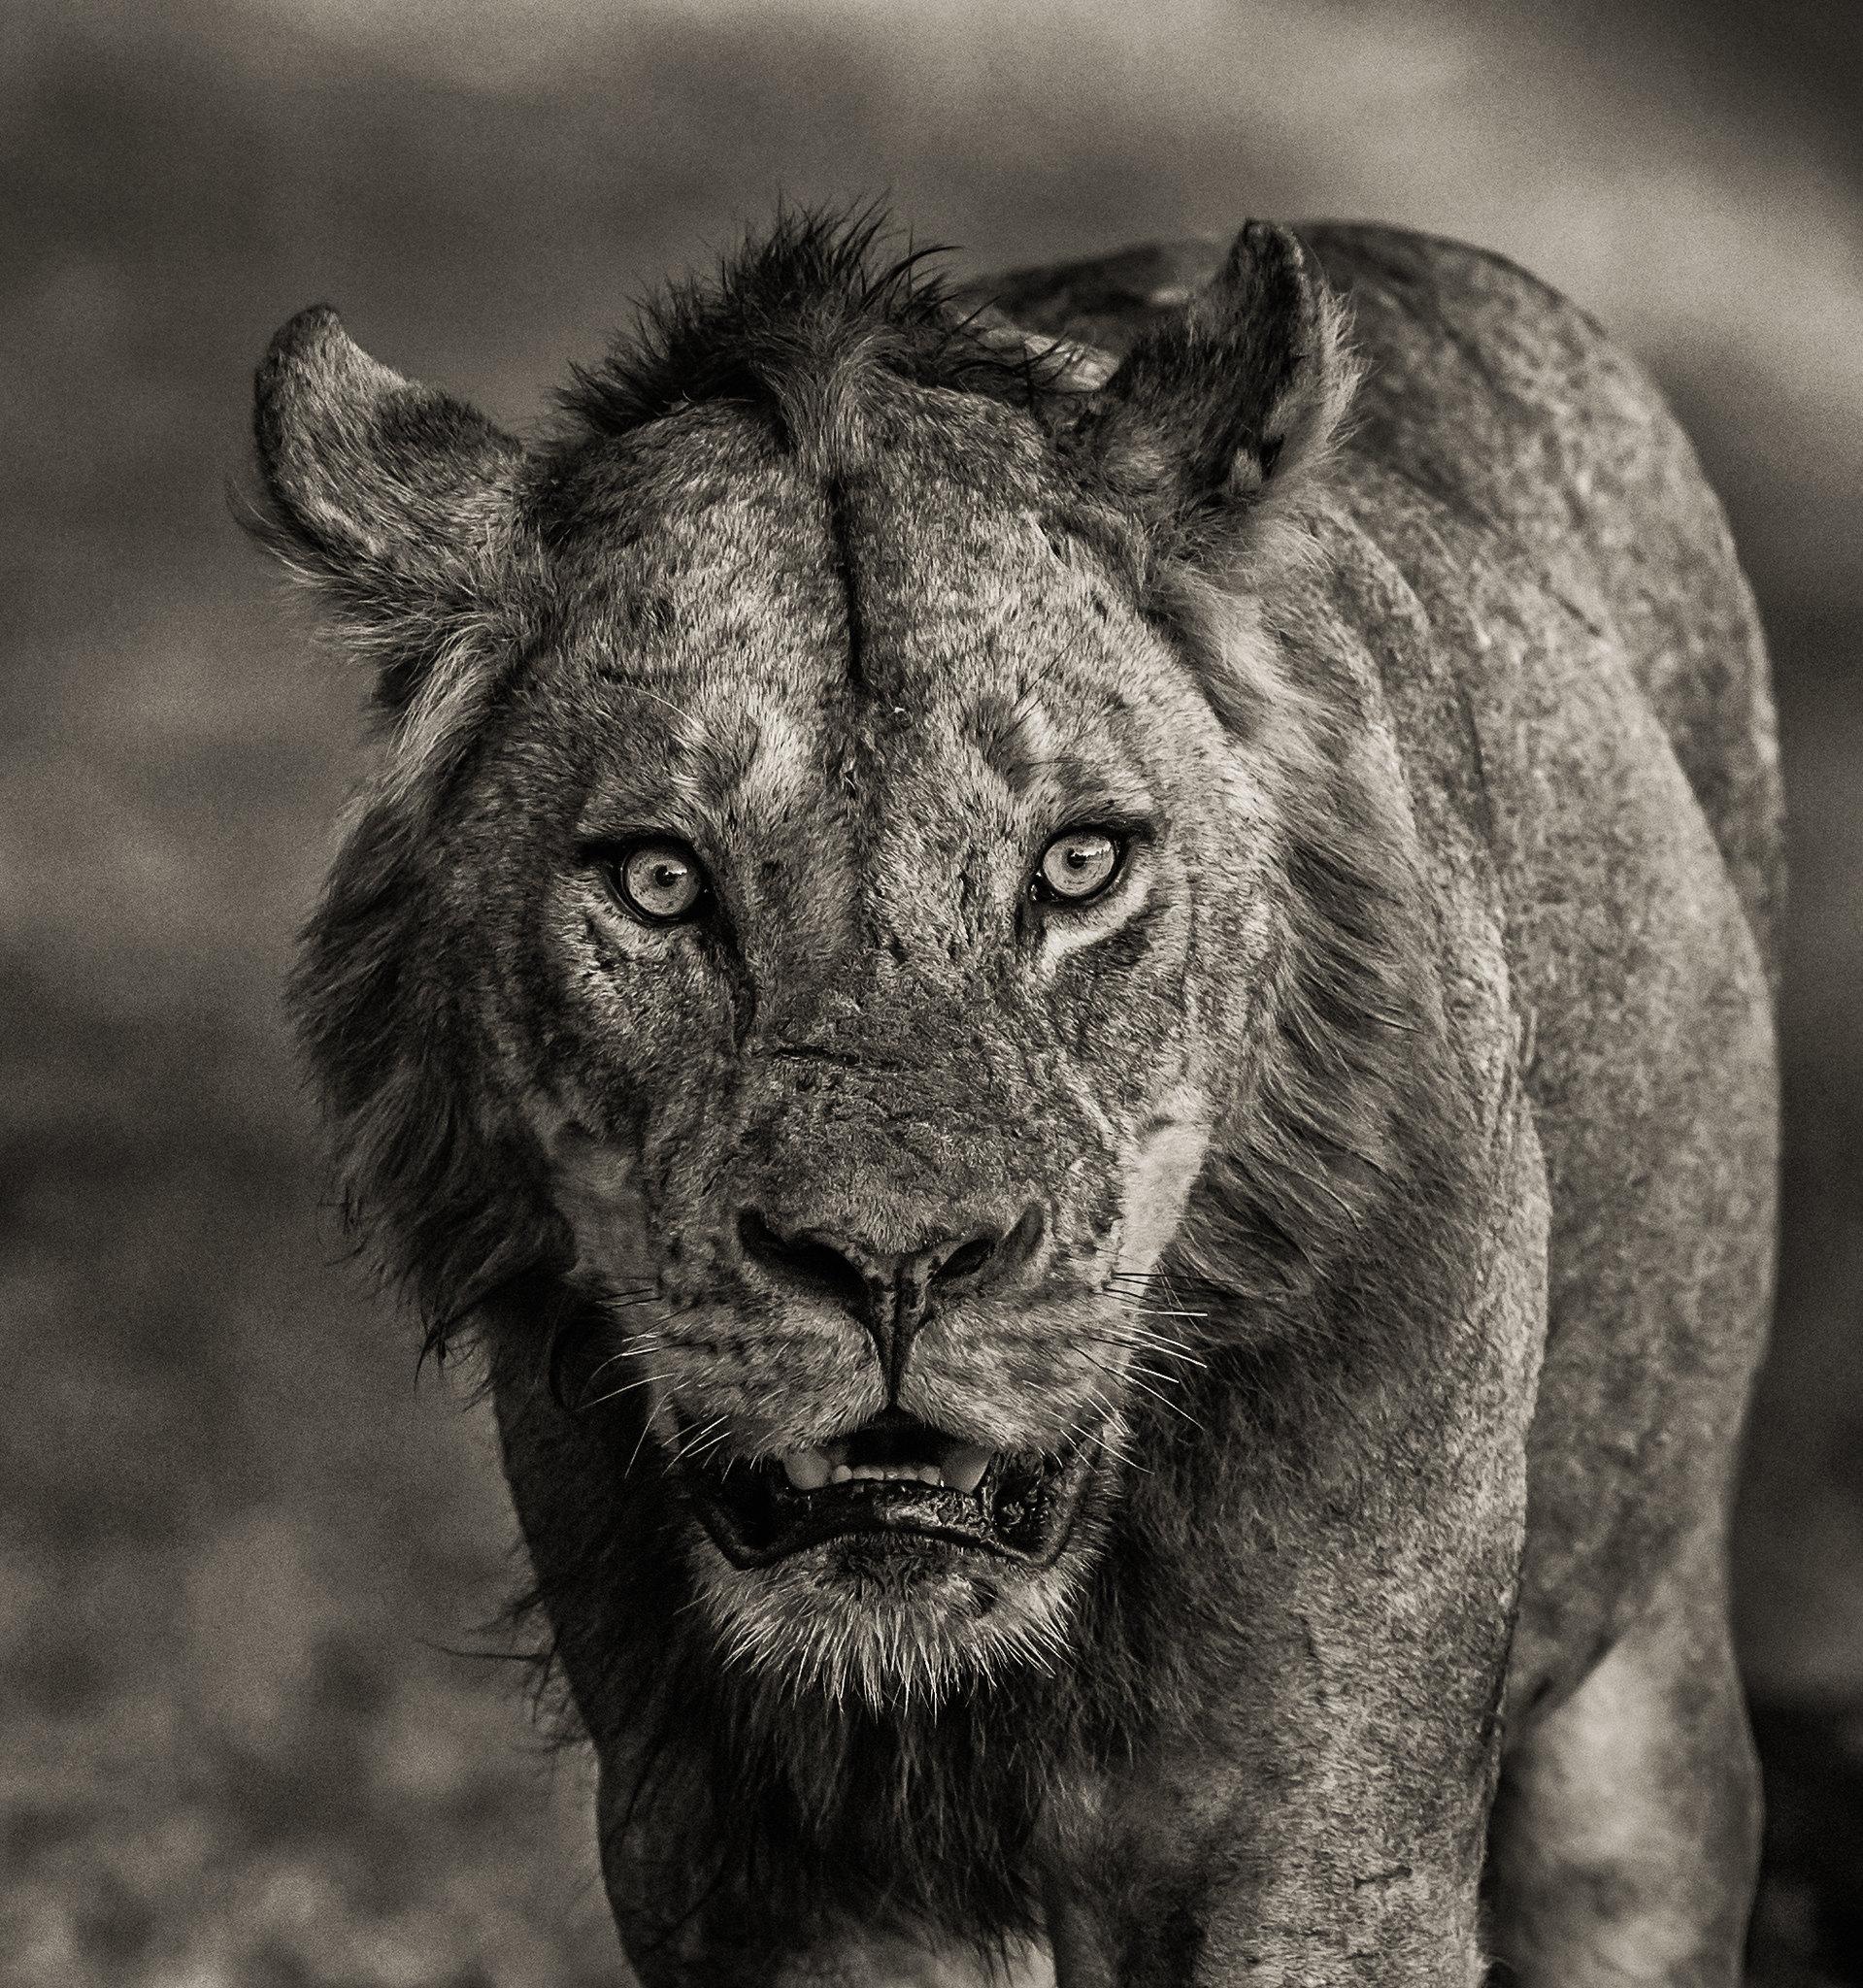 BEAST - African Lion - Zambia 2019.jpg